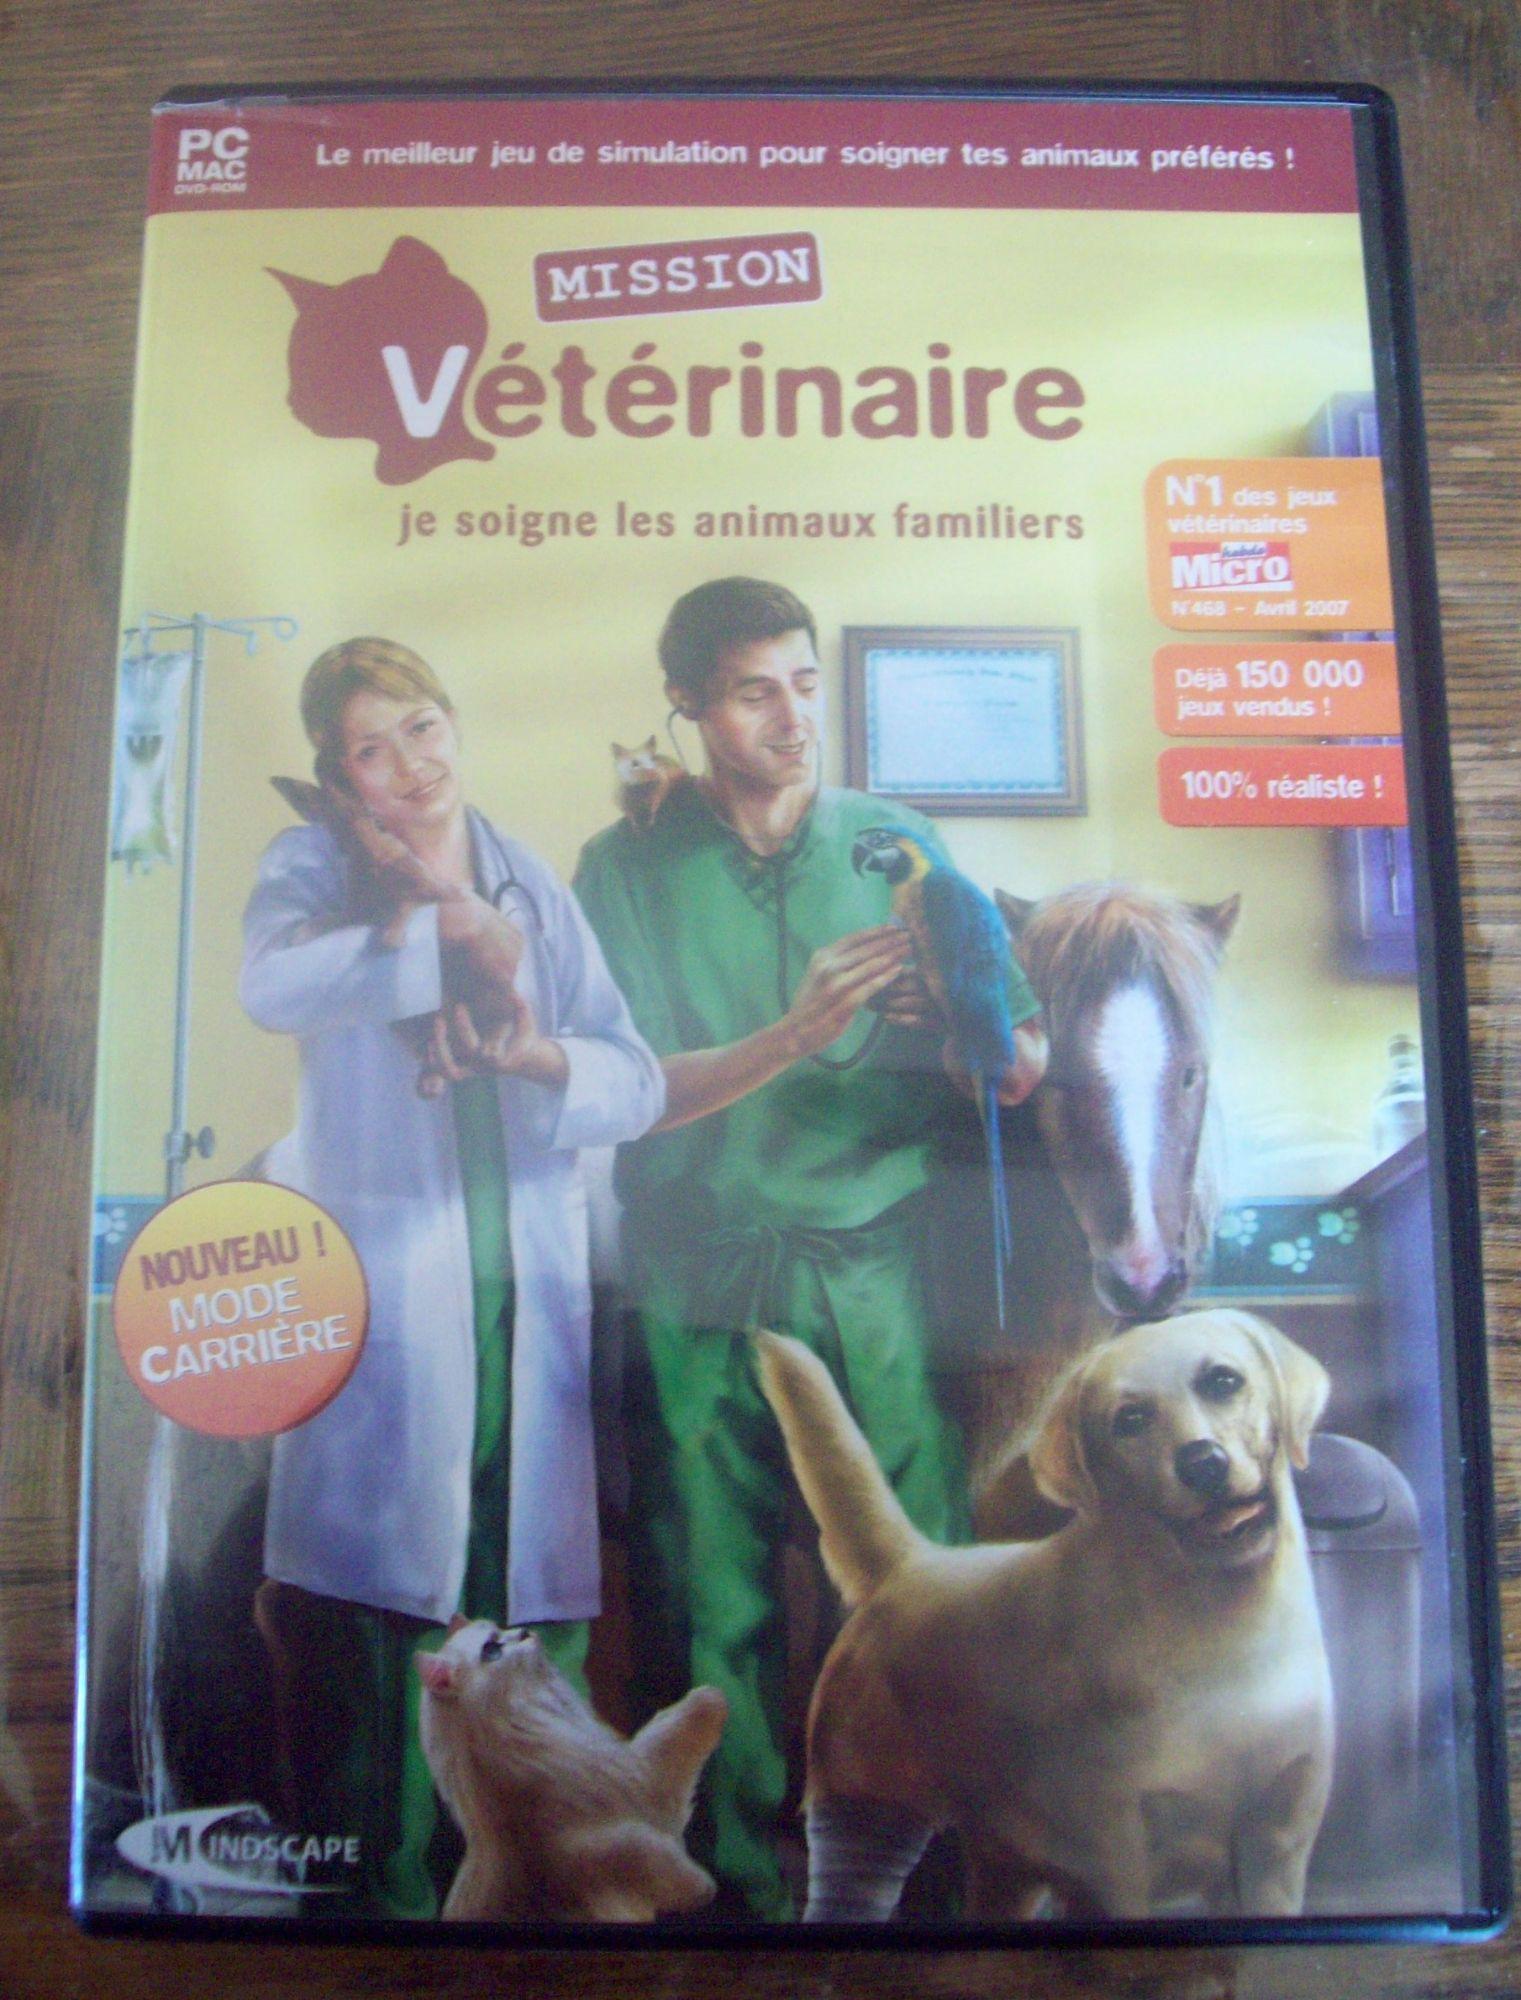 Jeux Pour Soigner Les Animaux : soigner, animaux, Mission, Veterinaire, Soigne, Animaux, Familiers, Rakuten